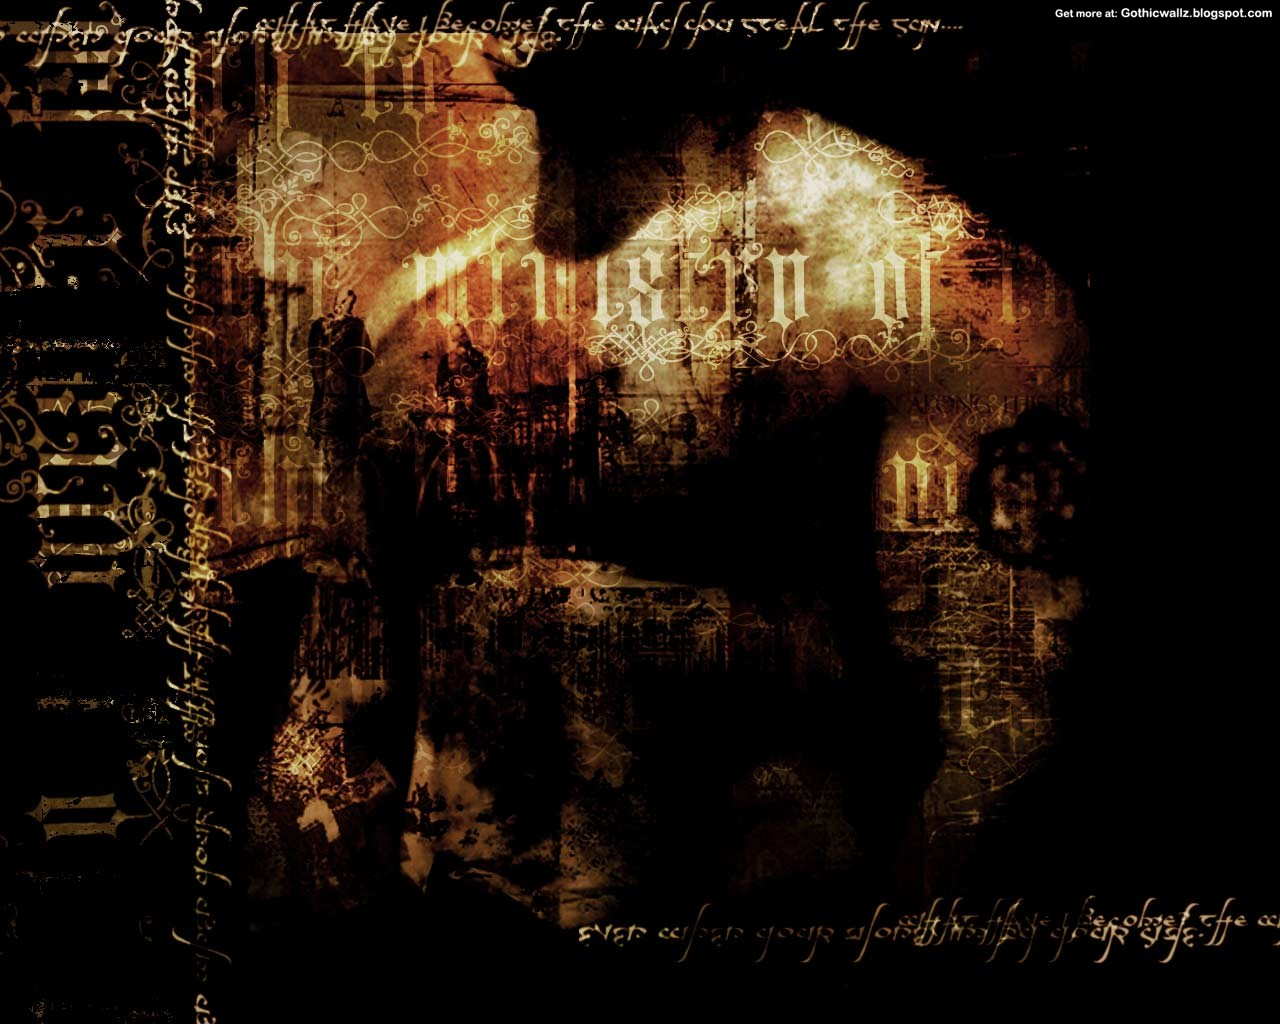 Gothicwallz-deathtoallbelonging.jpg